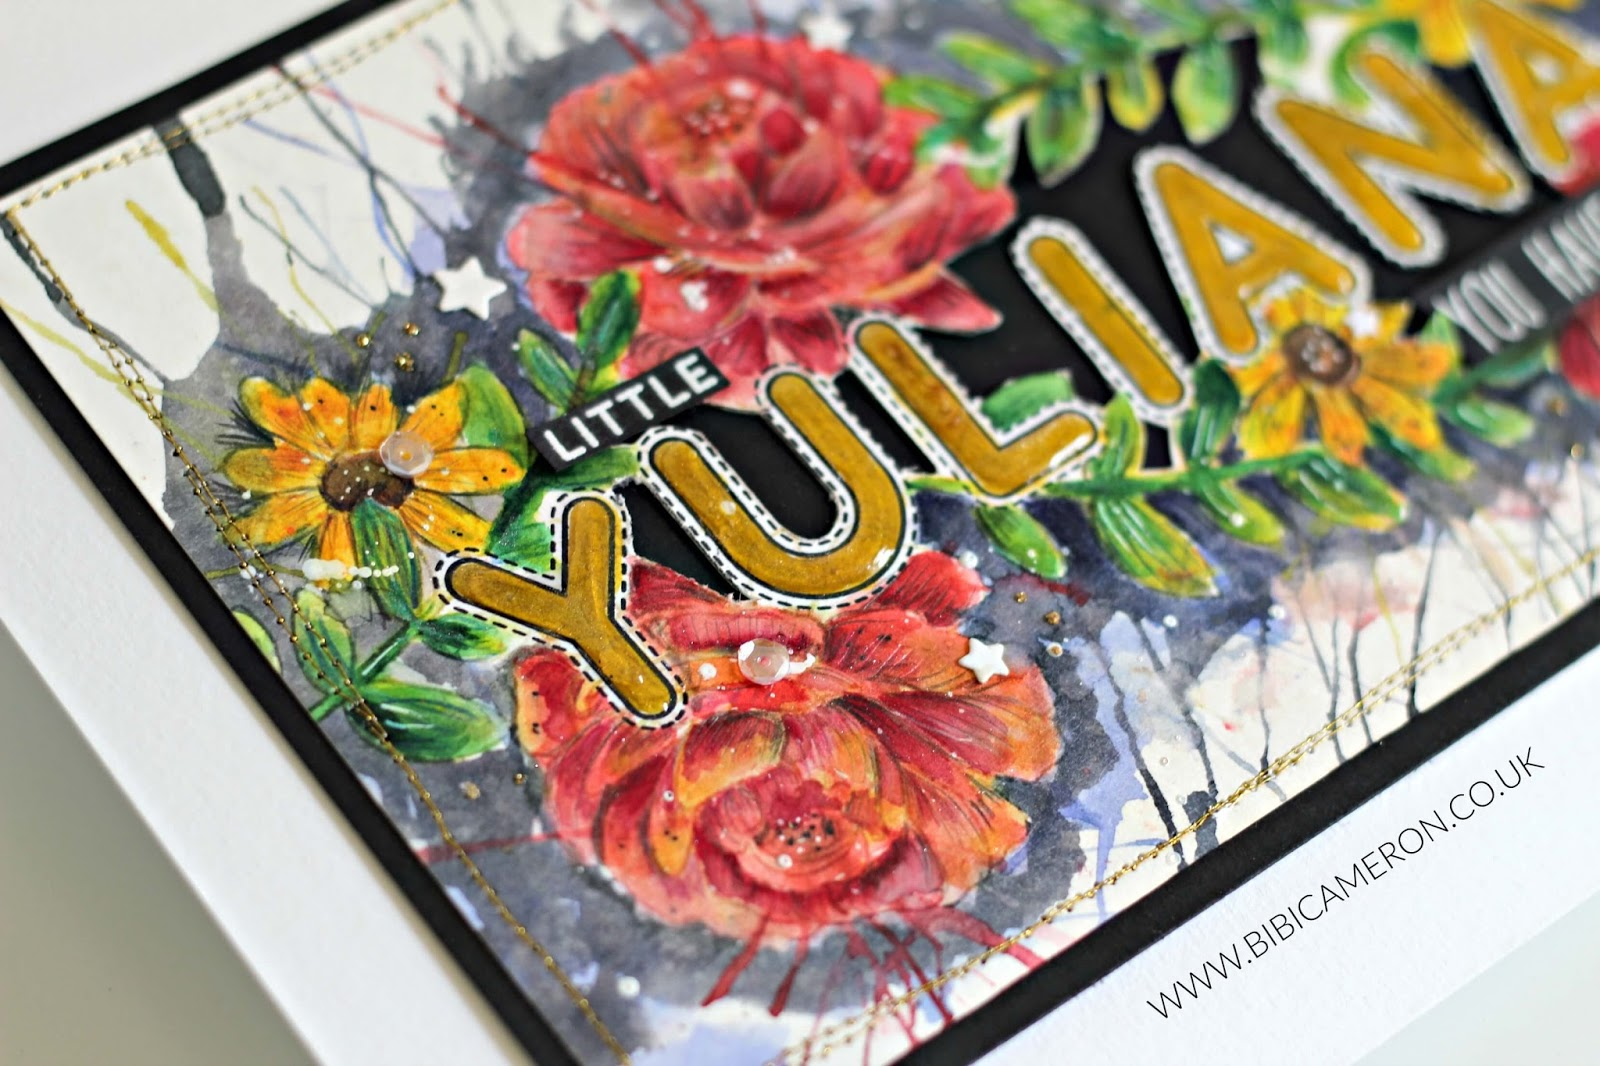 Watercolour Flowers in Yuliana's memory #niunamenos